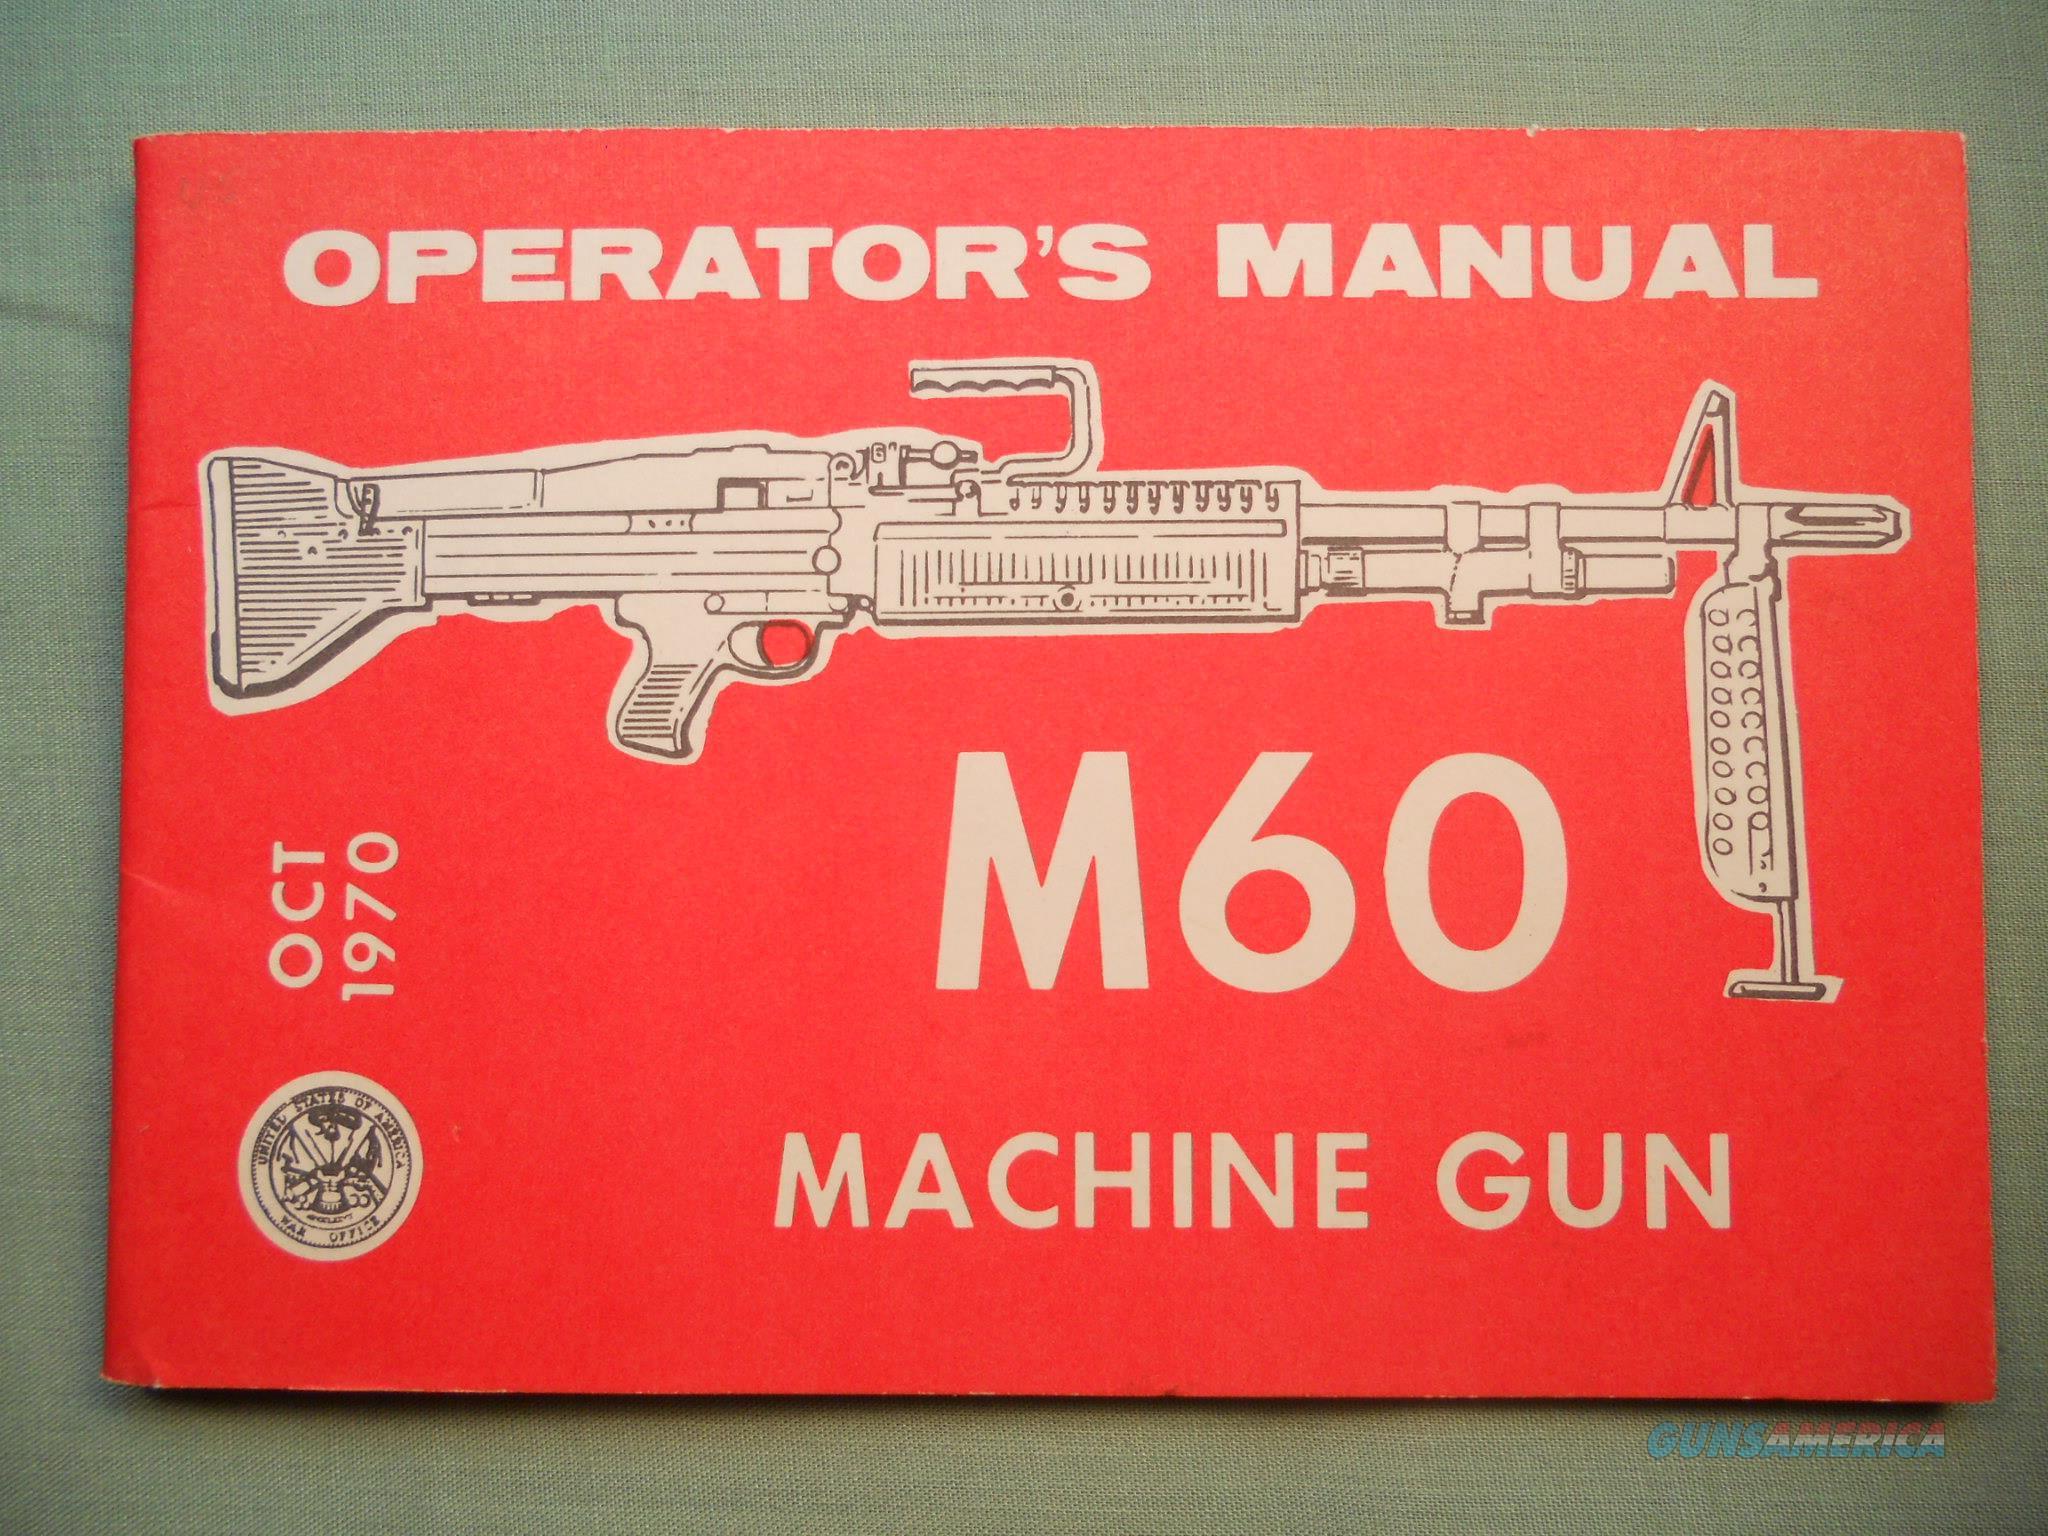 M60 Technical Manual 9-1005-224-10 M60 Operator Manual.. OCT 1970  Non-Guns > Magazines & Clips > Subgun Magazines > Clips > Other